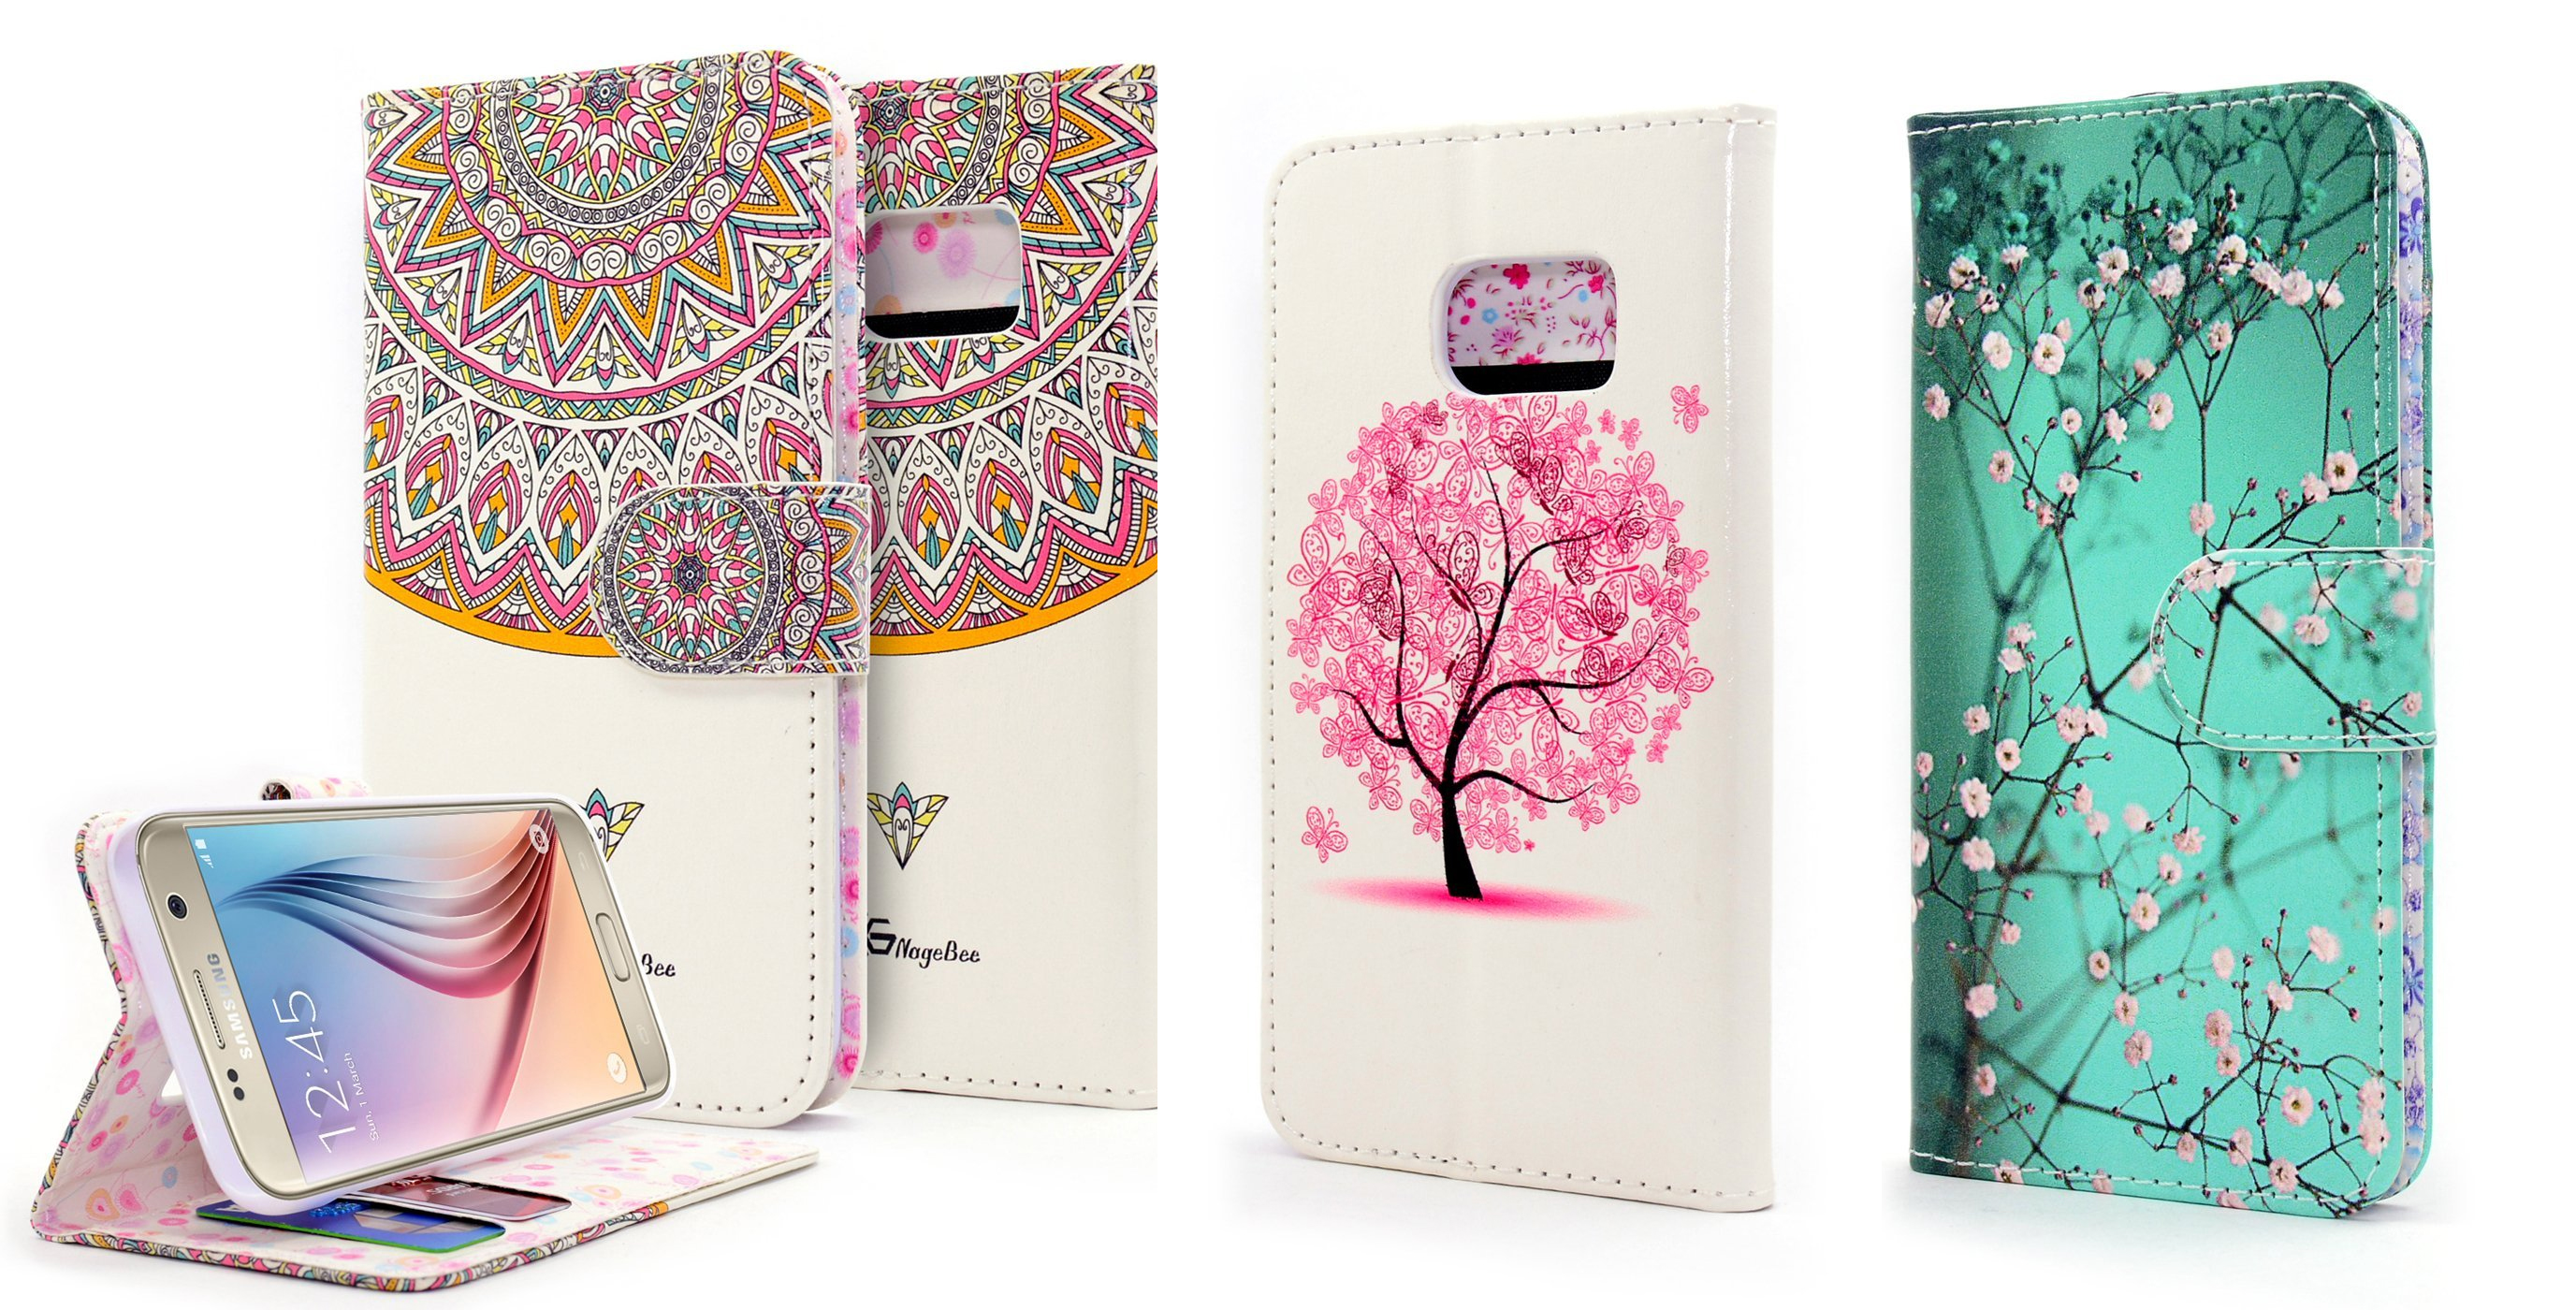 Galaxy S7 Case Galaxy Premium Leather Wallet Flip Case